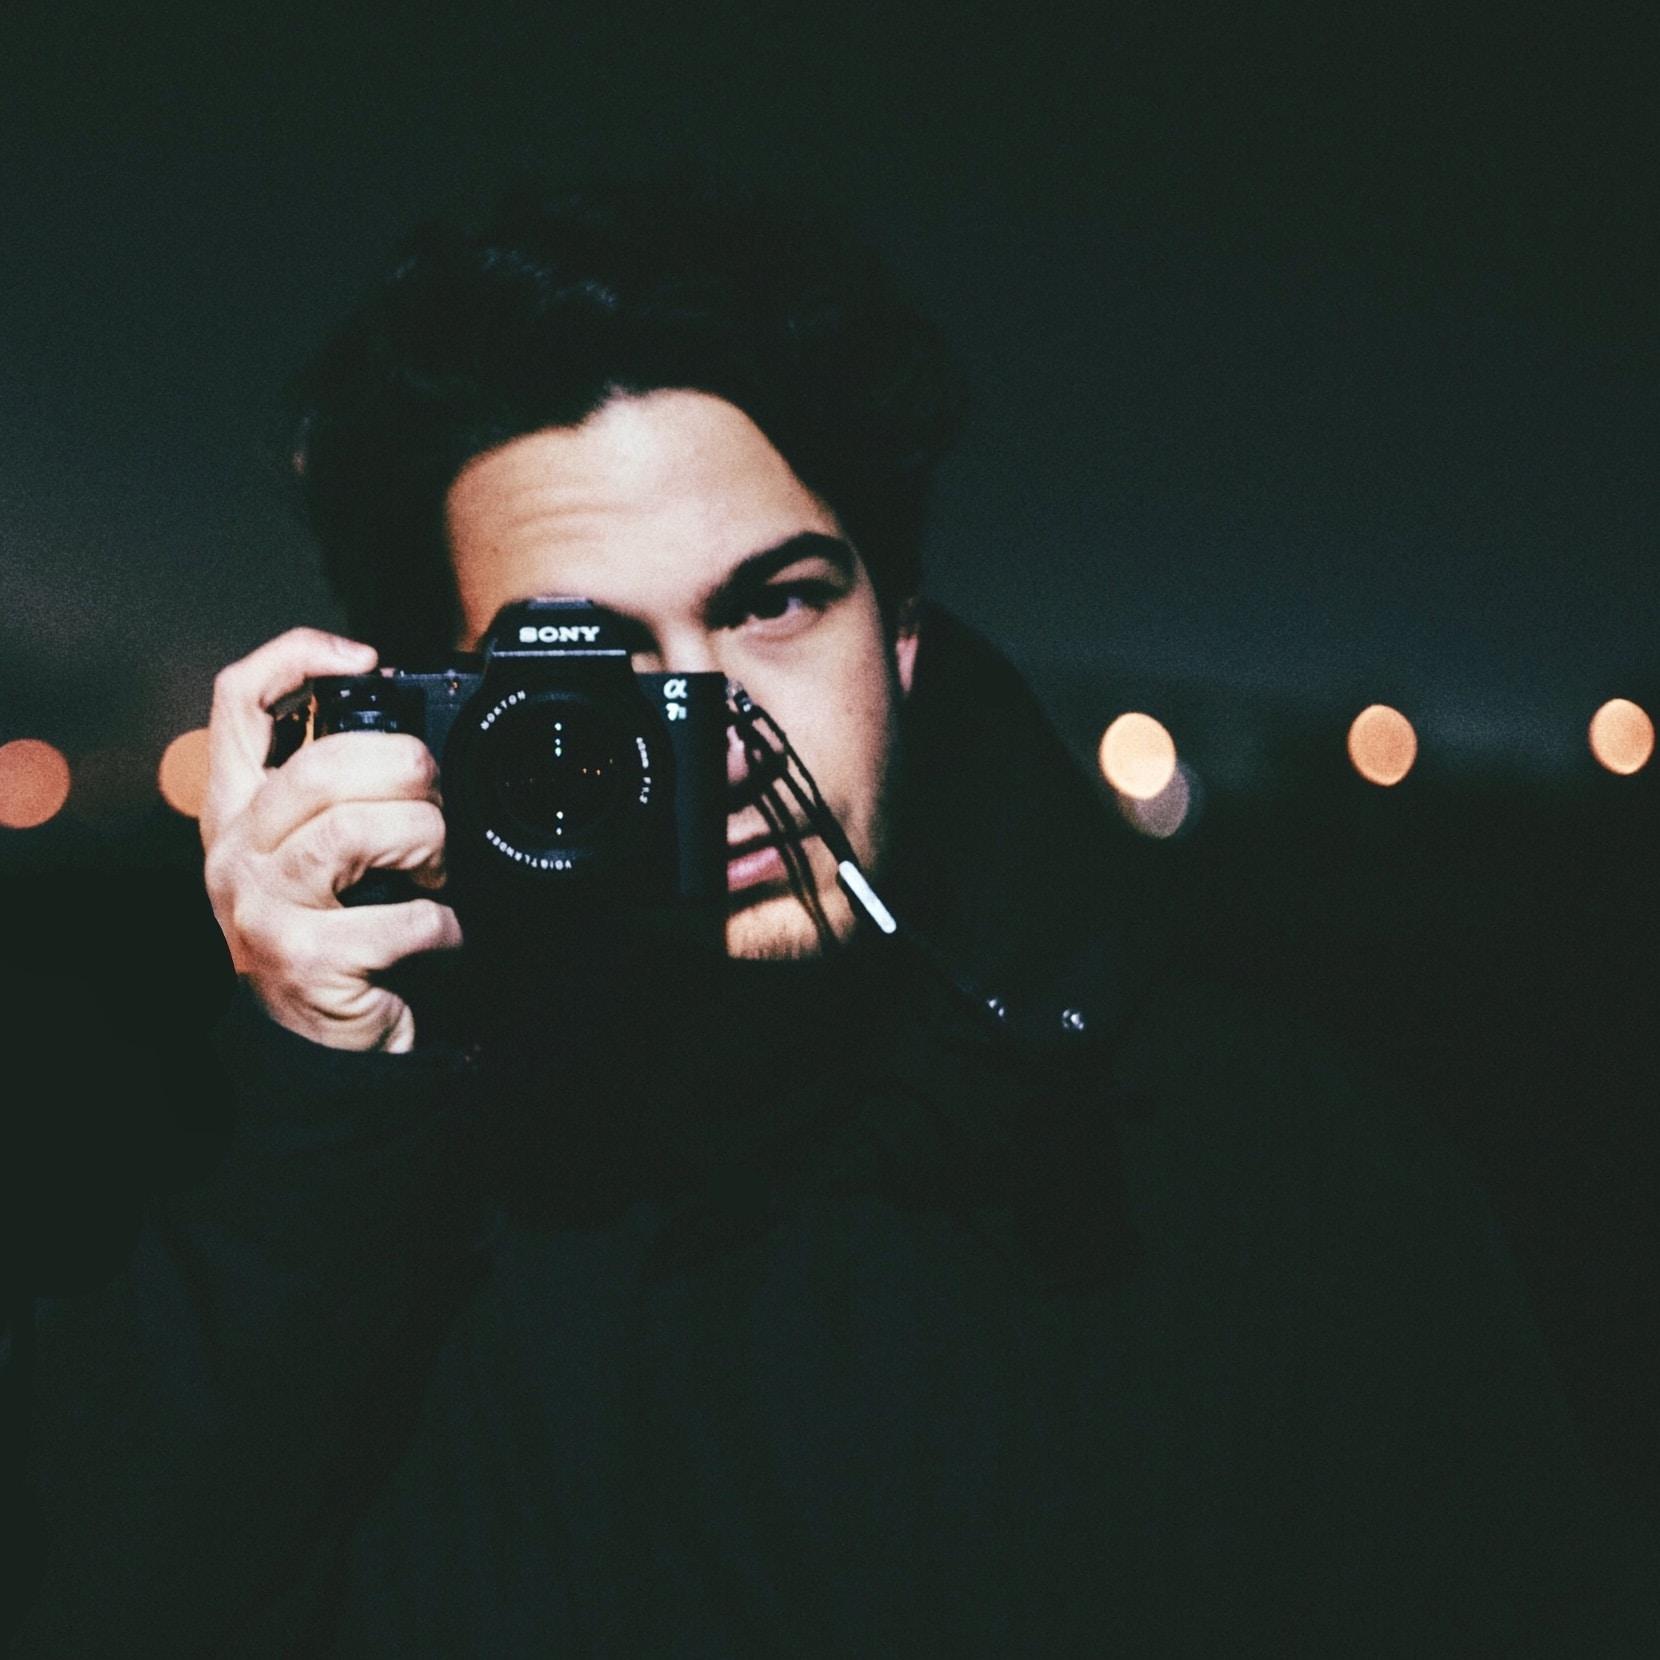 Go to Samuele Errico Piccarini's profile